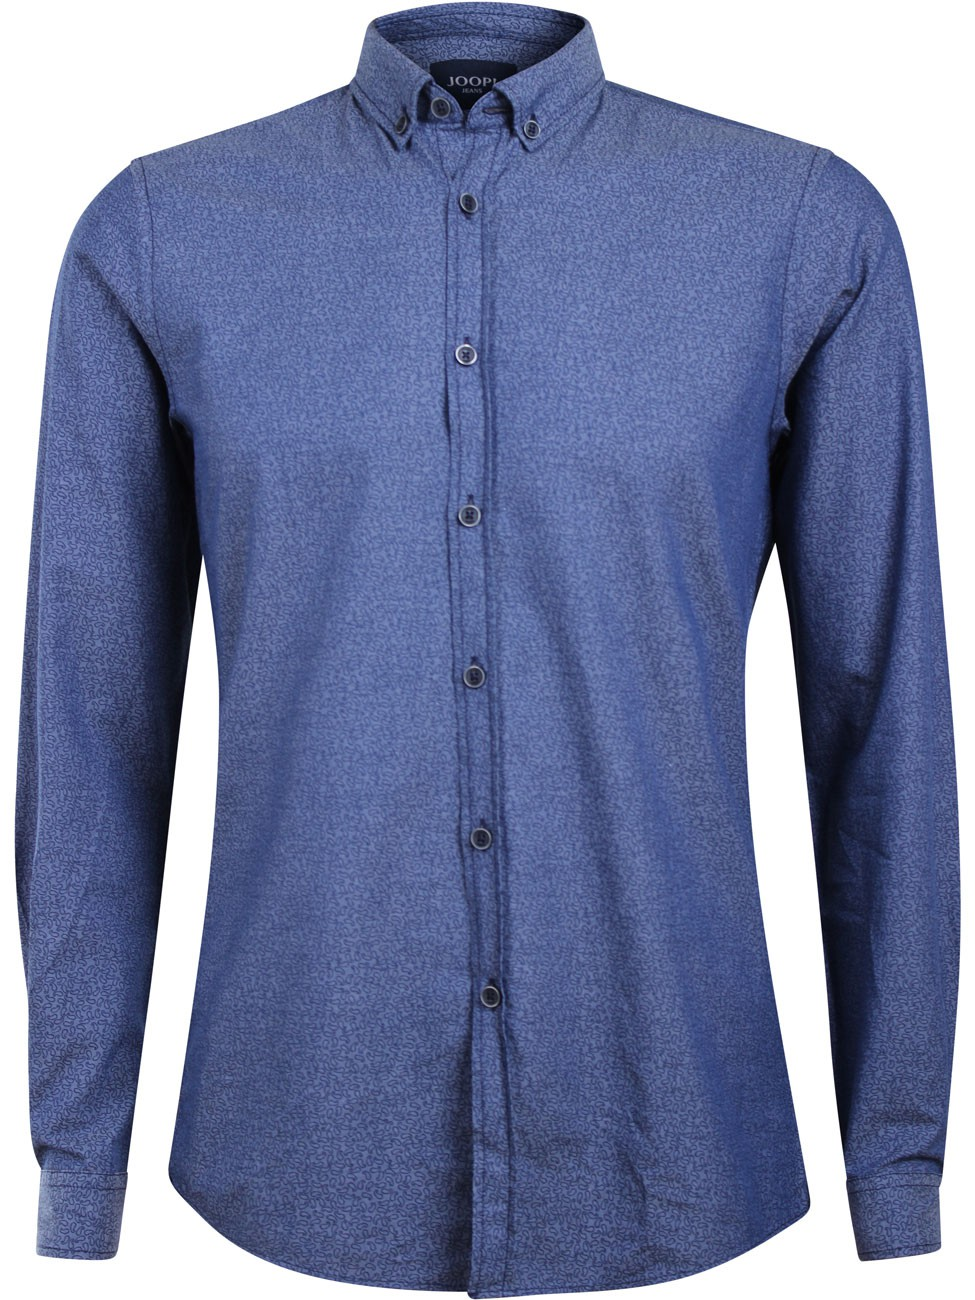 joop herren business hemd haye modern fit blau kaufen. Black Bedroom Furniture Sets. Home Design Ideas